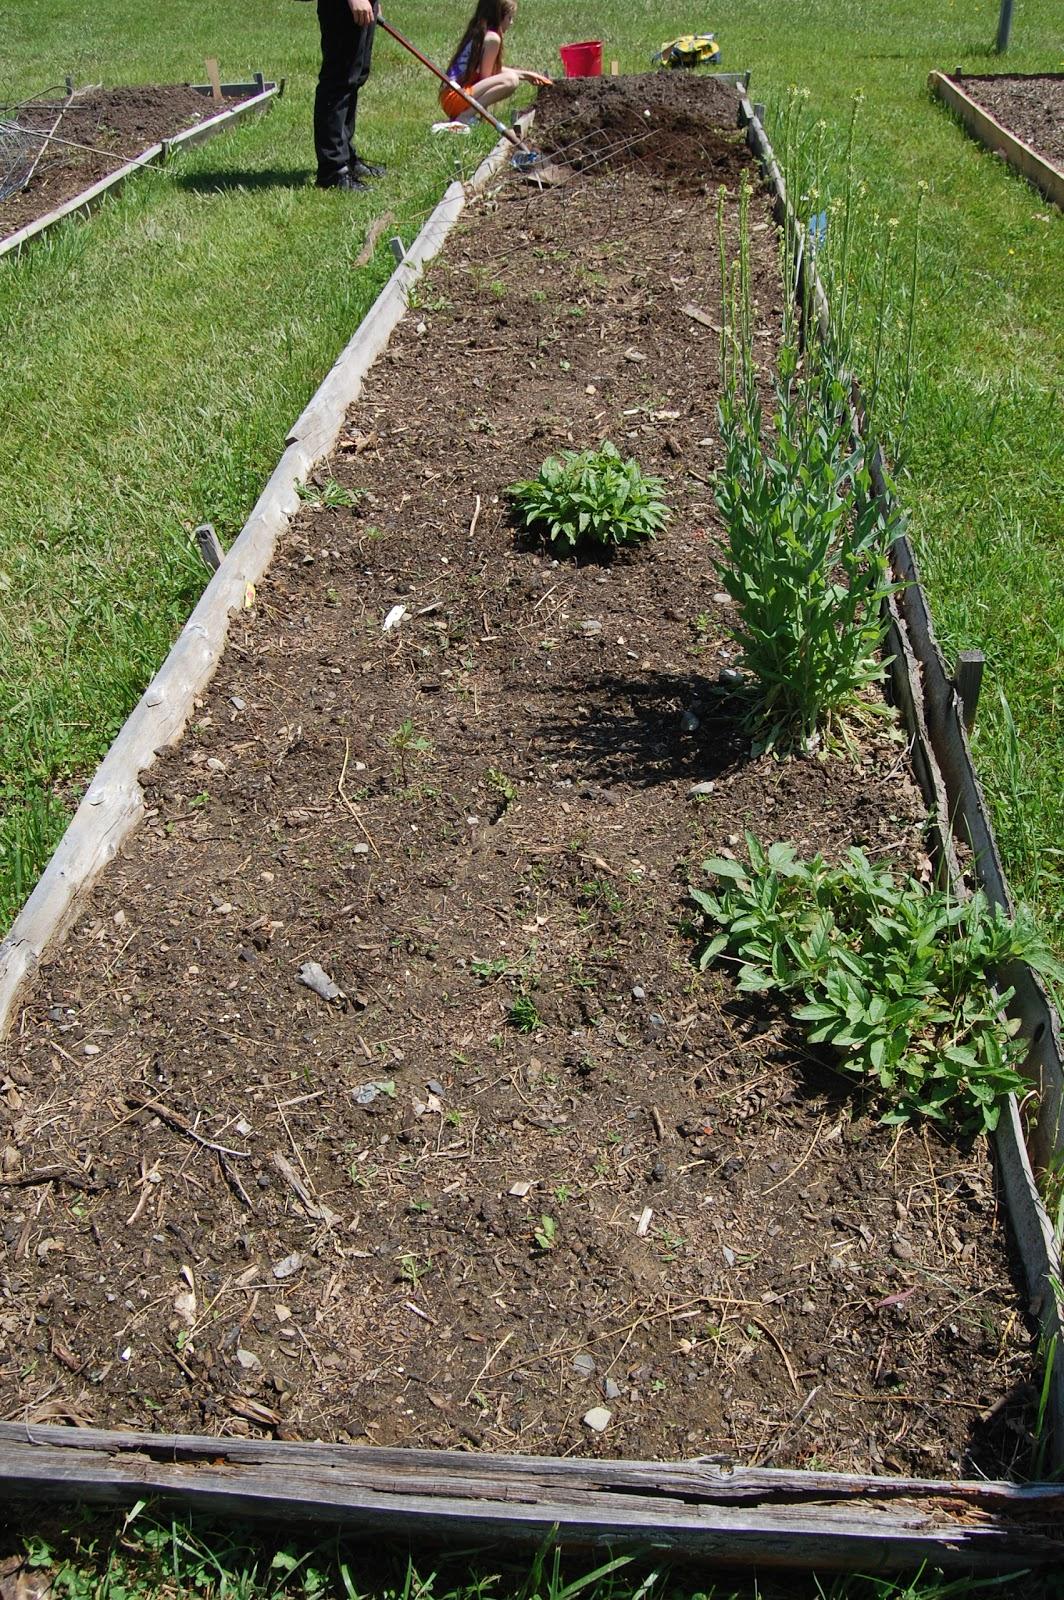 Sprouts: Caroline's Community Garden Plot: Take 2